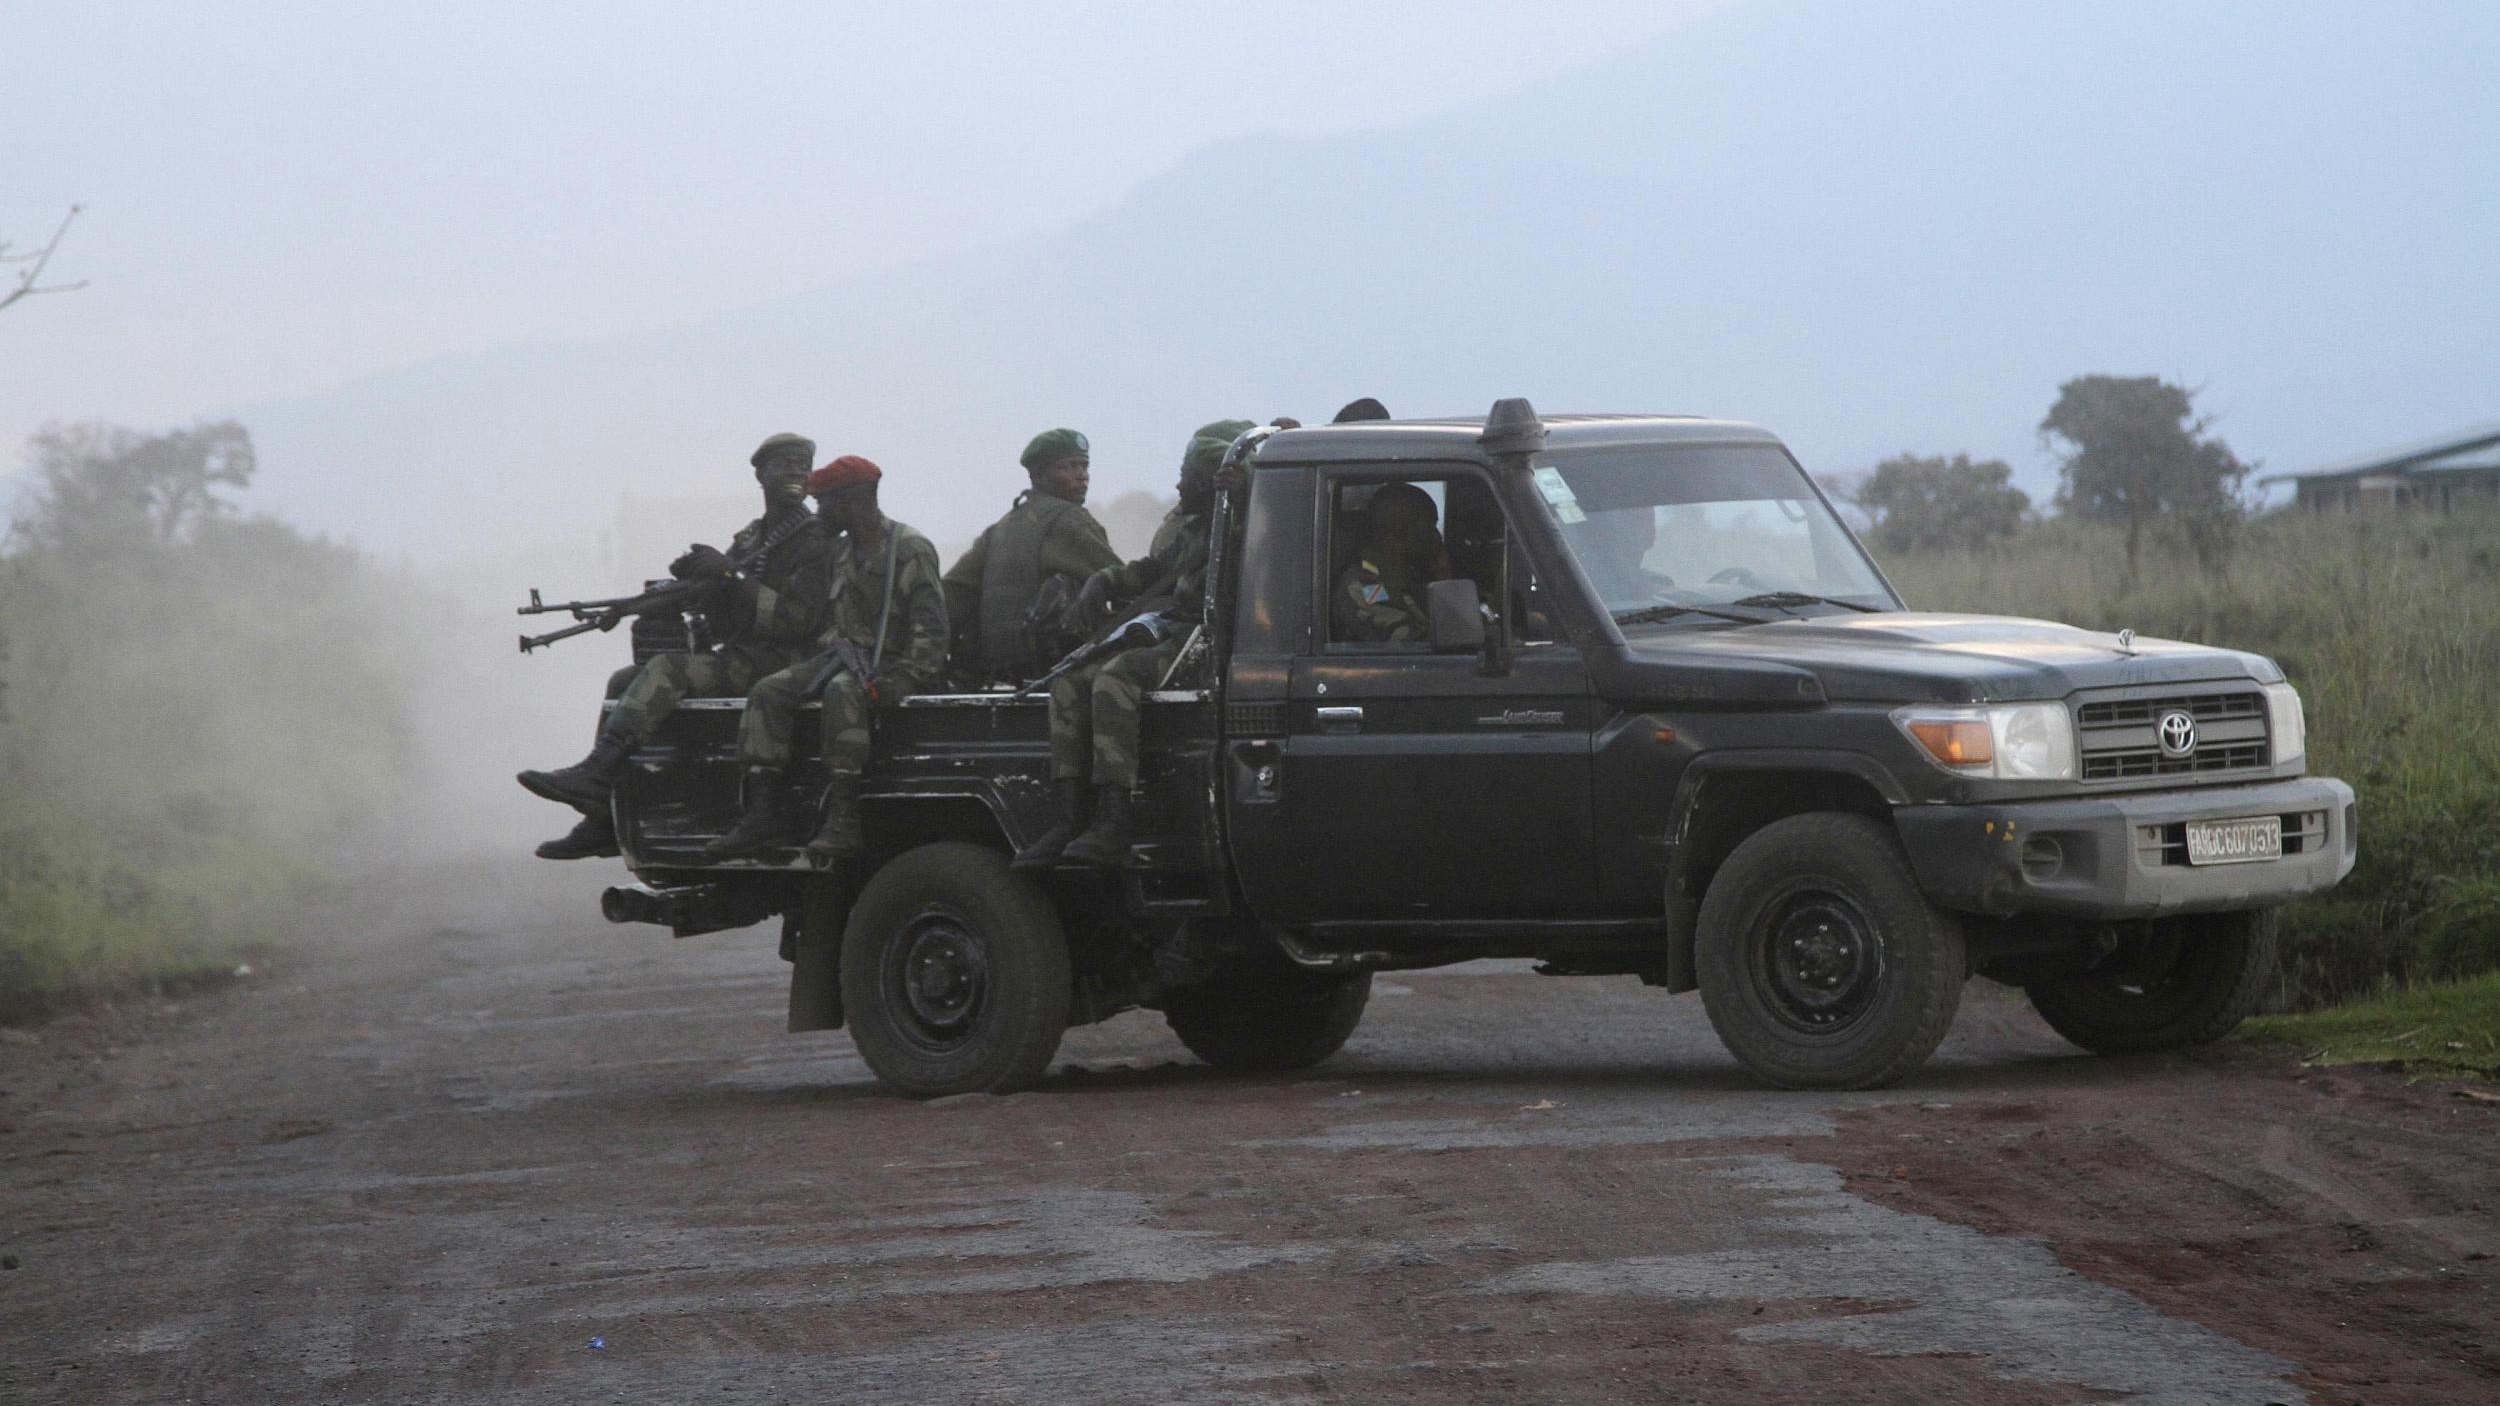 At least 10 dead in attack in eastern DR Congo's Beni region -- media